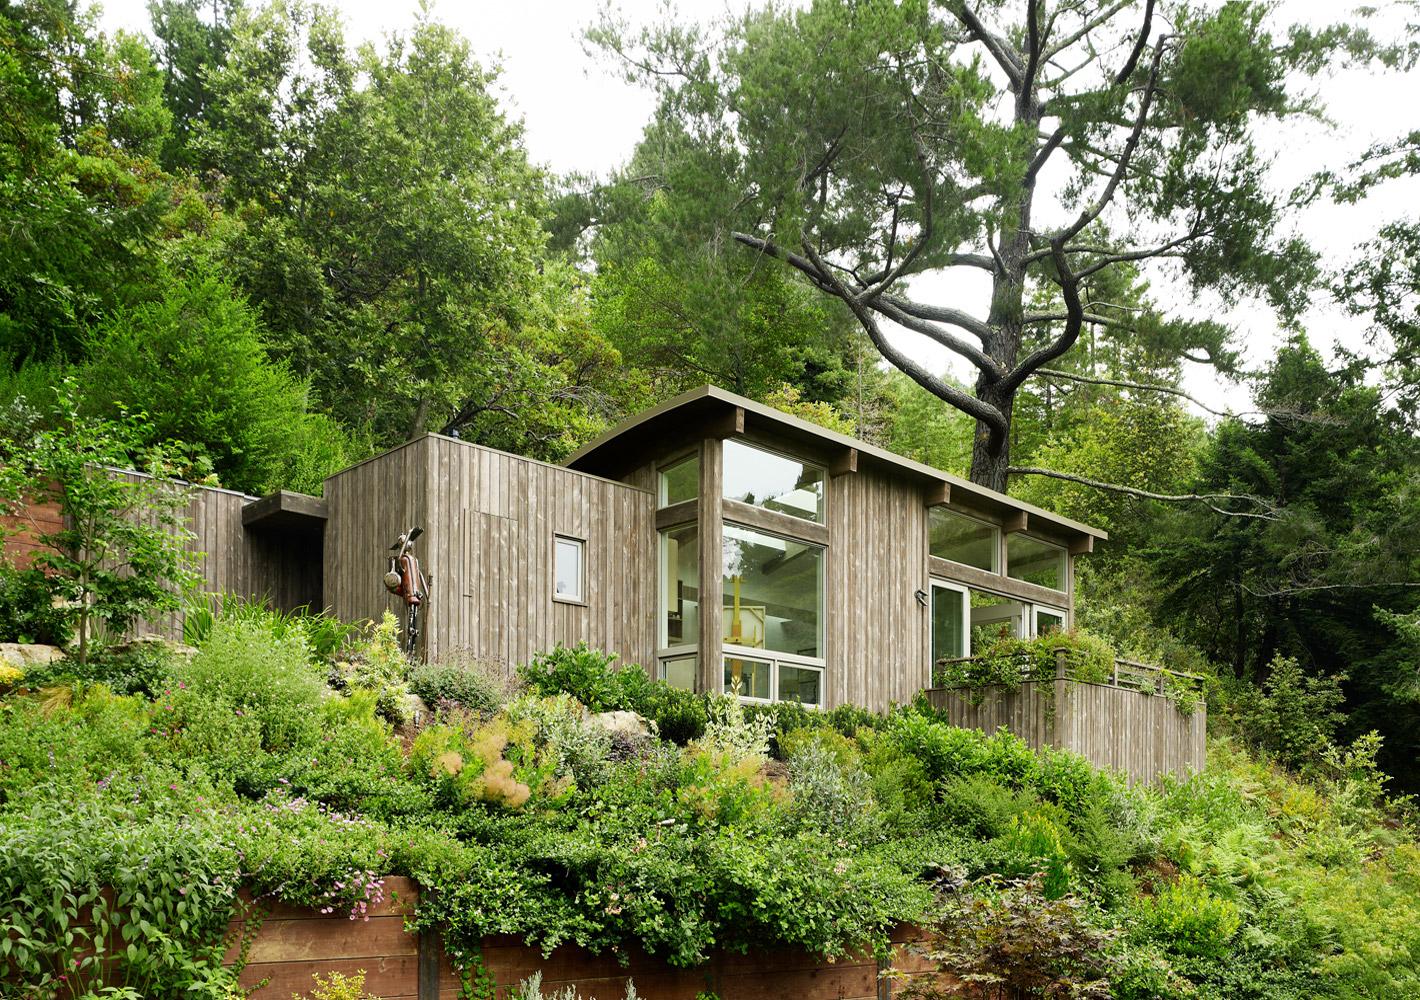 Mill valley cabins feldman architecture for Feldman architecture